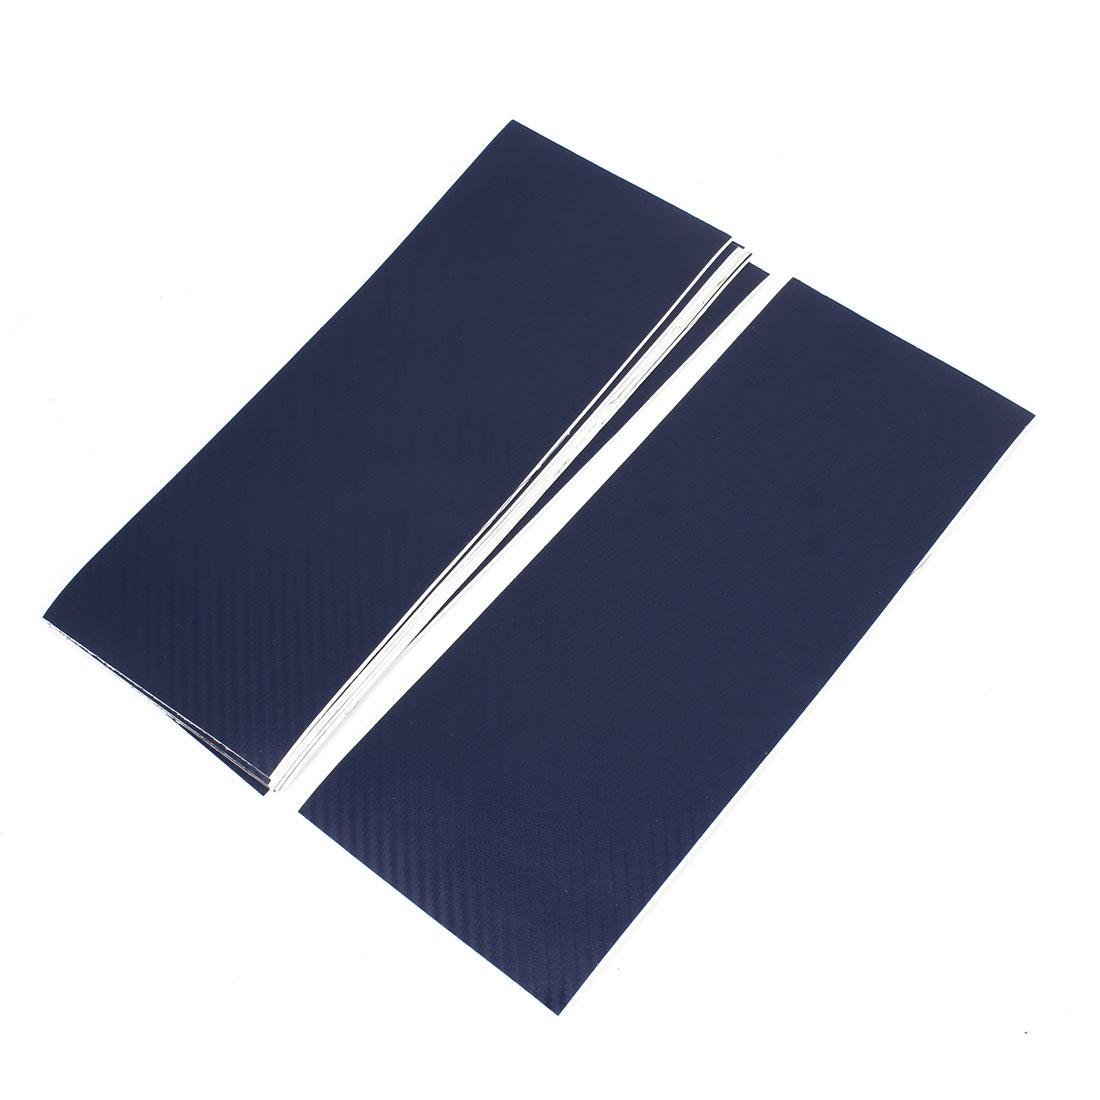 10pcs 300 x 115mm Adhesive Back Carbon Fiber Print Protective Vinyl Film Sticker Dark Blue for Car